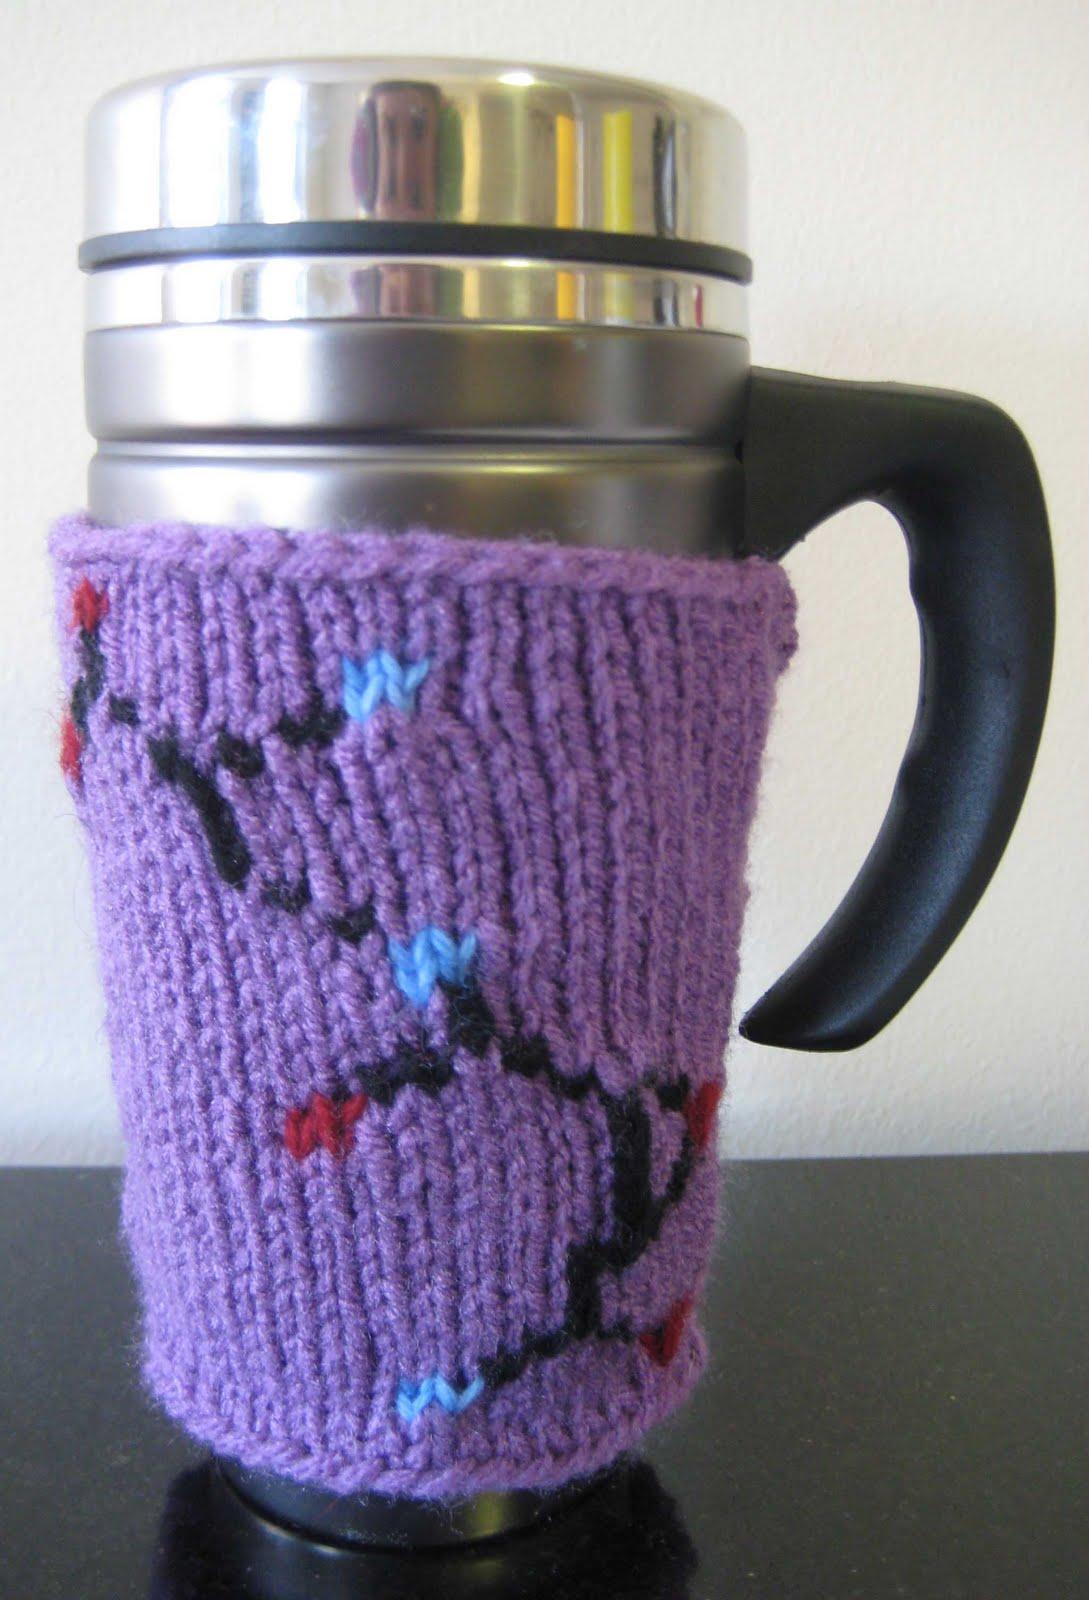 ChemKnits: Antibacterial Travel Mug Cozy